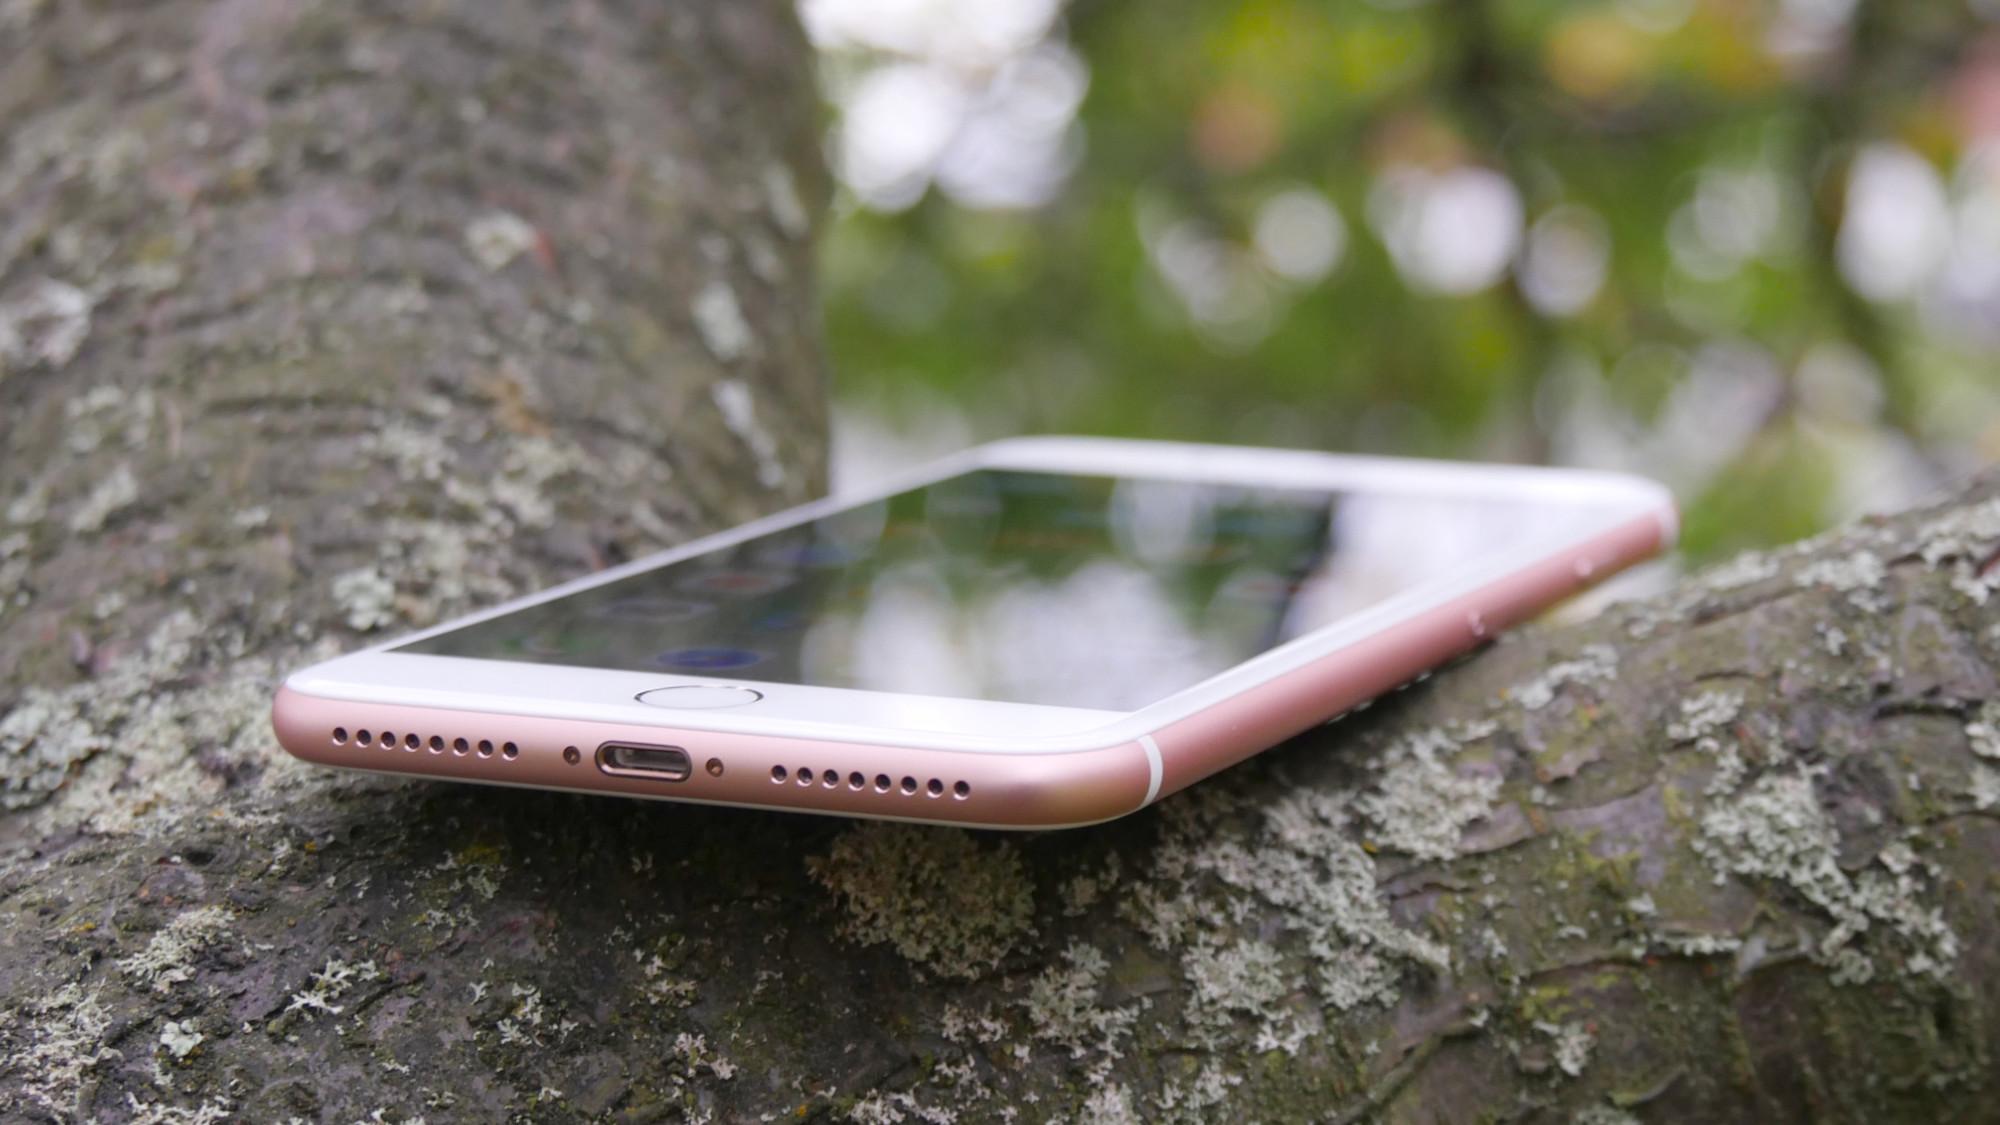 Test  Apple iPhone 7 Plus – telefonen med zoomkamera 5d4059882f241